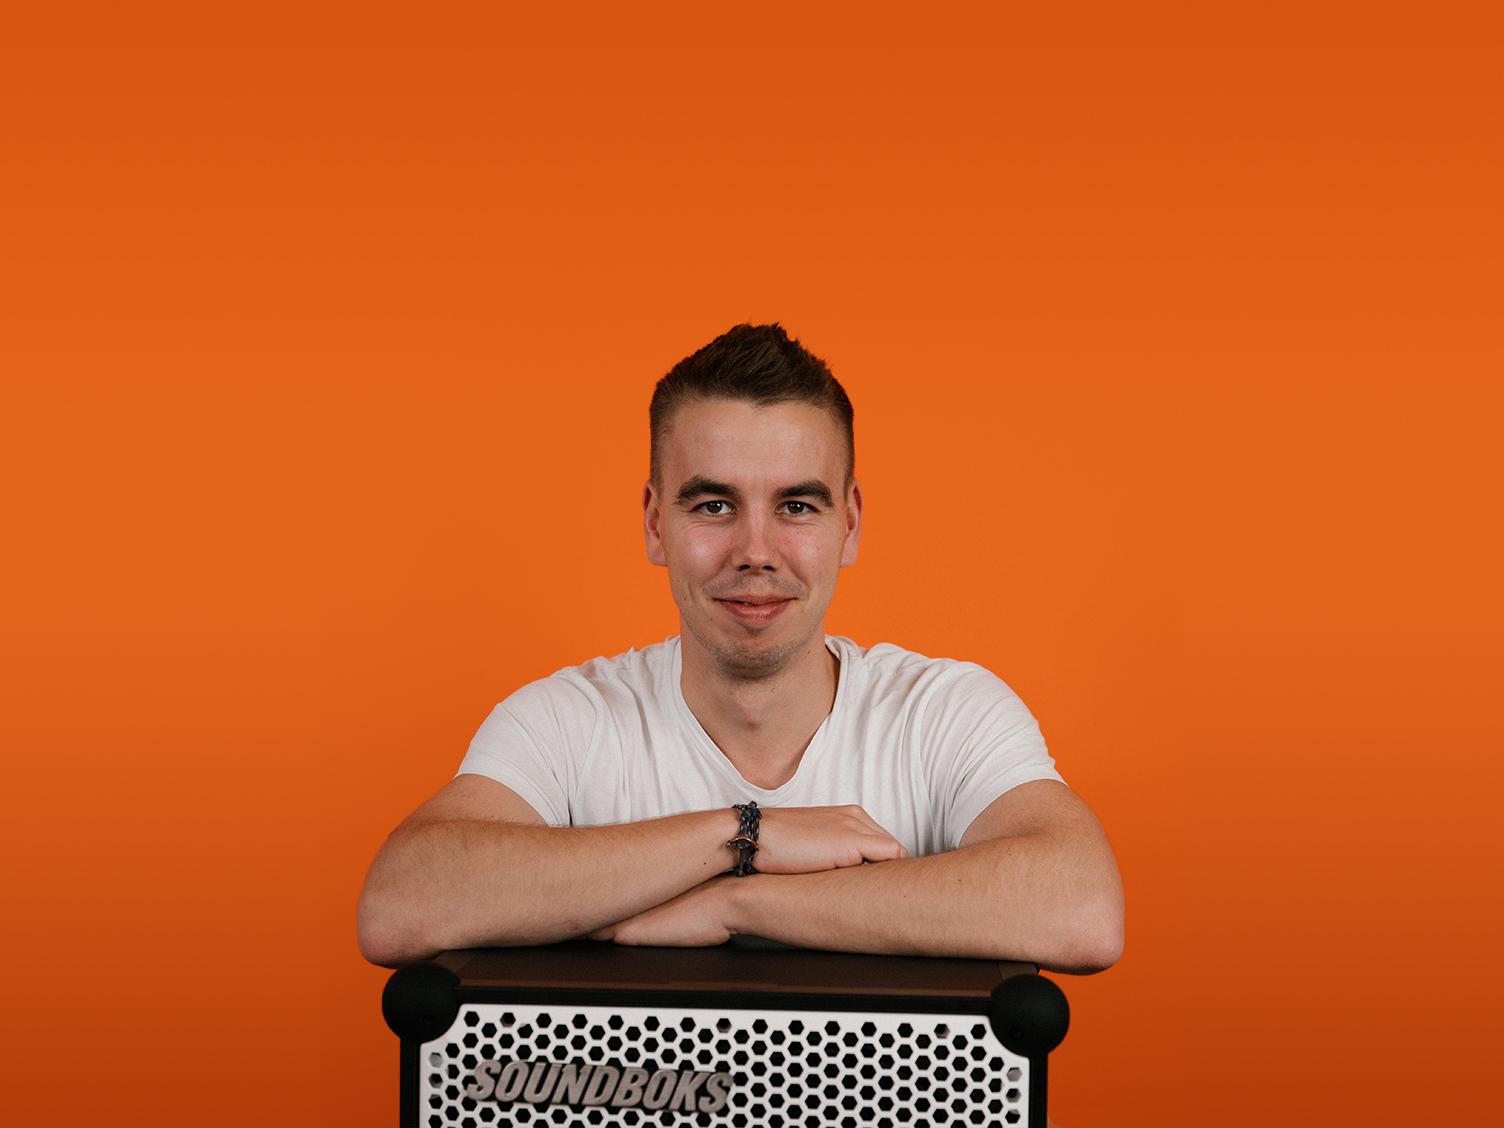 emil, a supply chain coordinator at soundboks leaning on top of a soundboks speaker